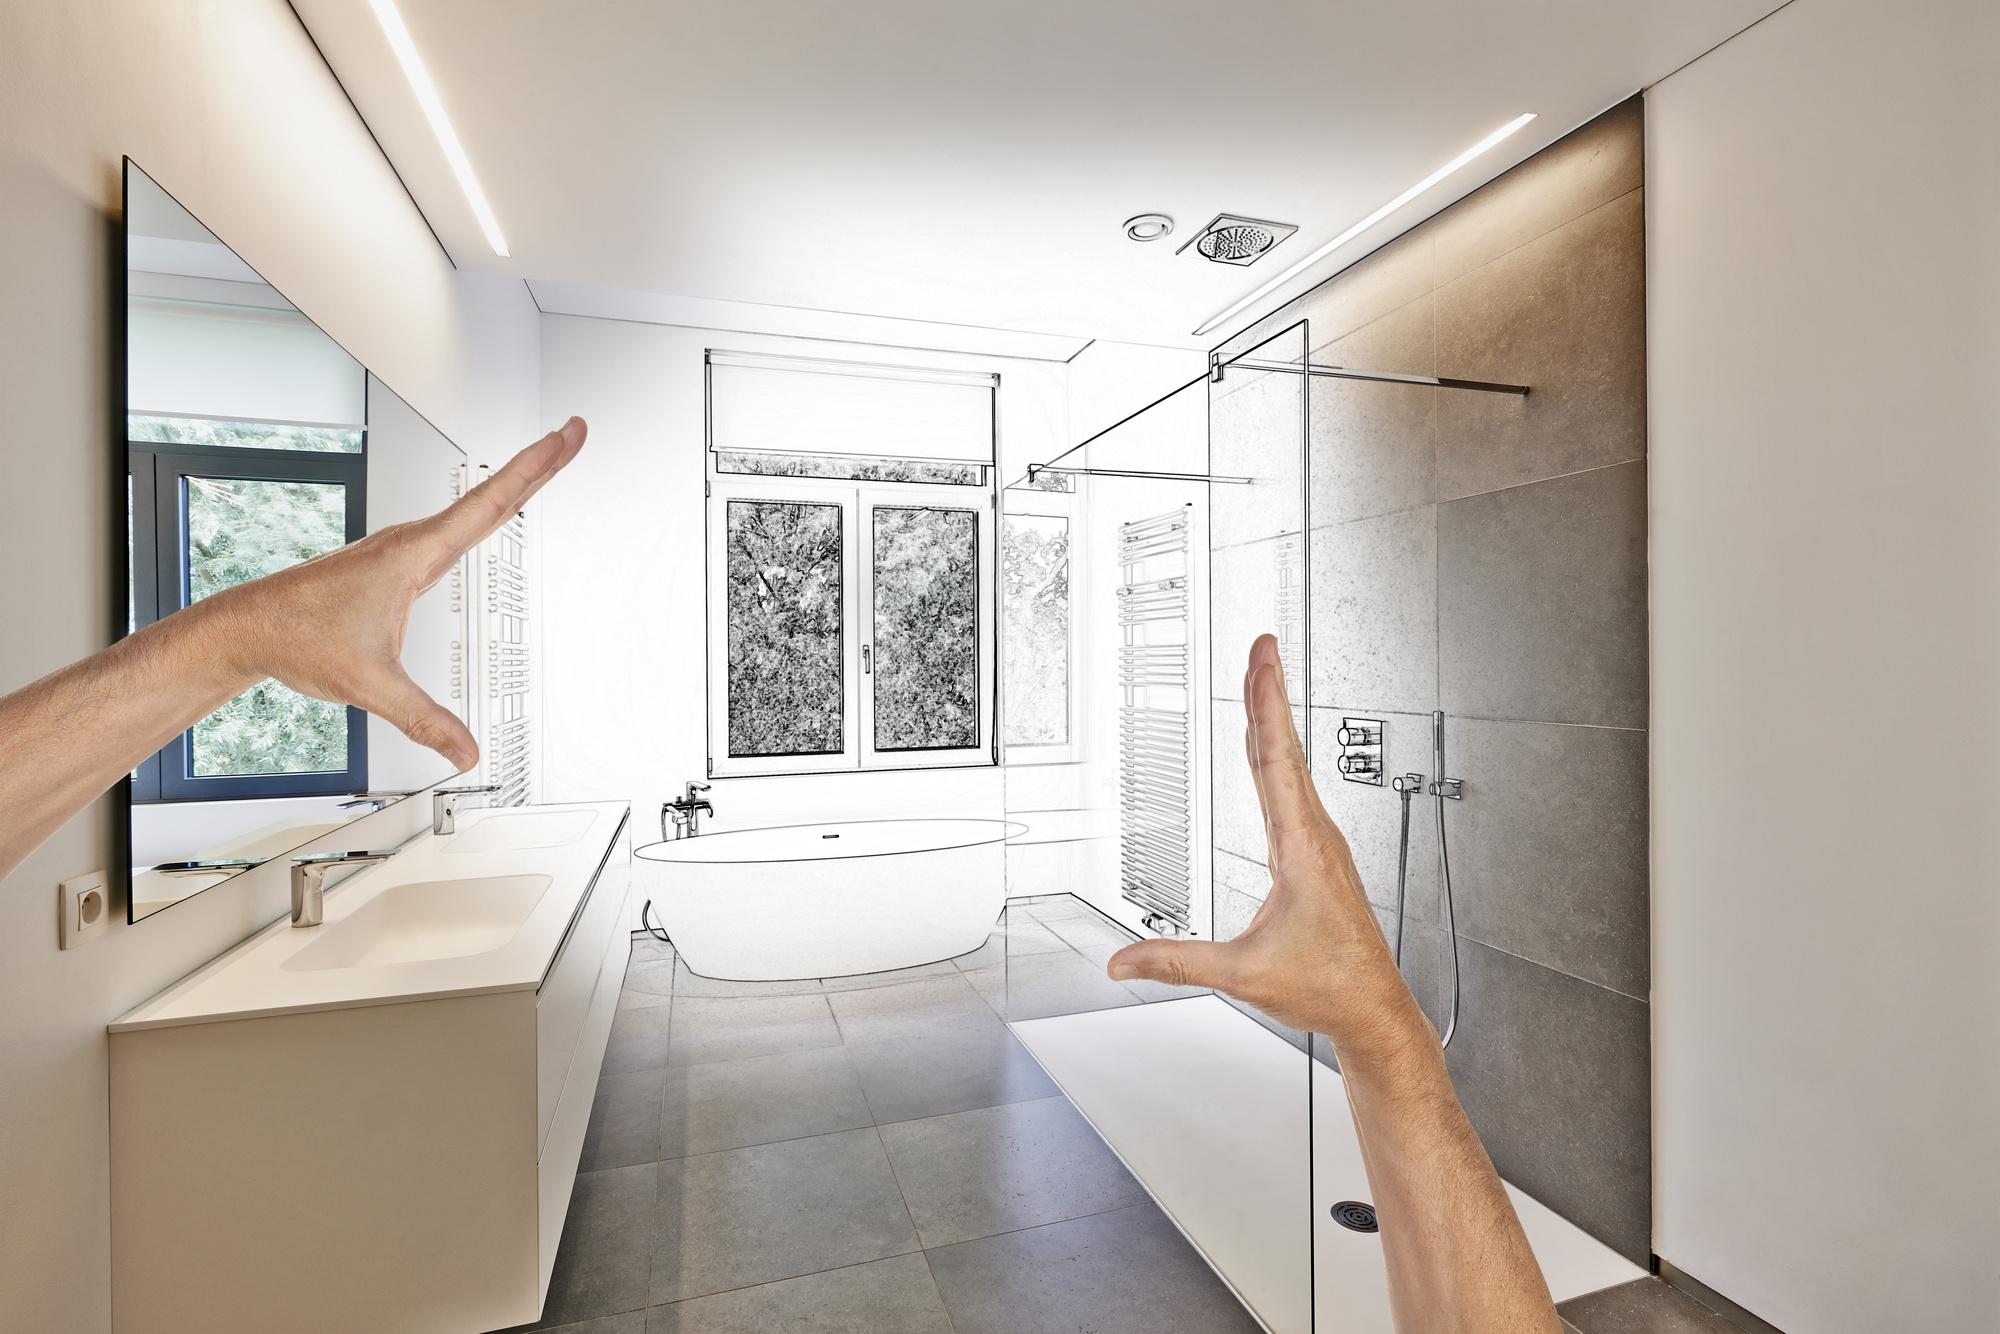 2020 bathroom remodeling trends